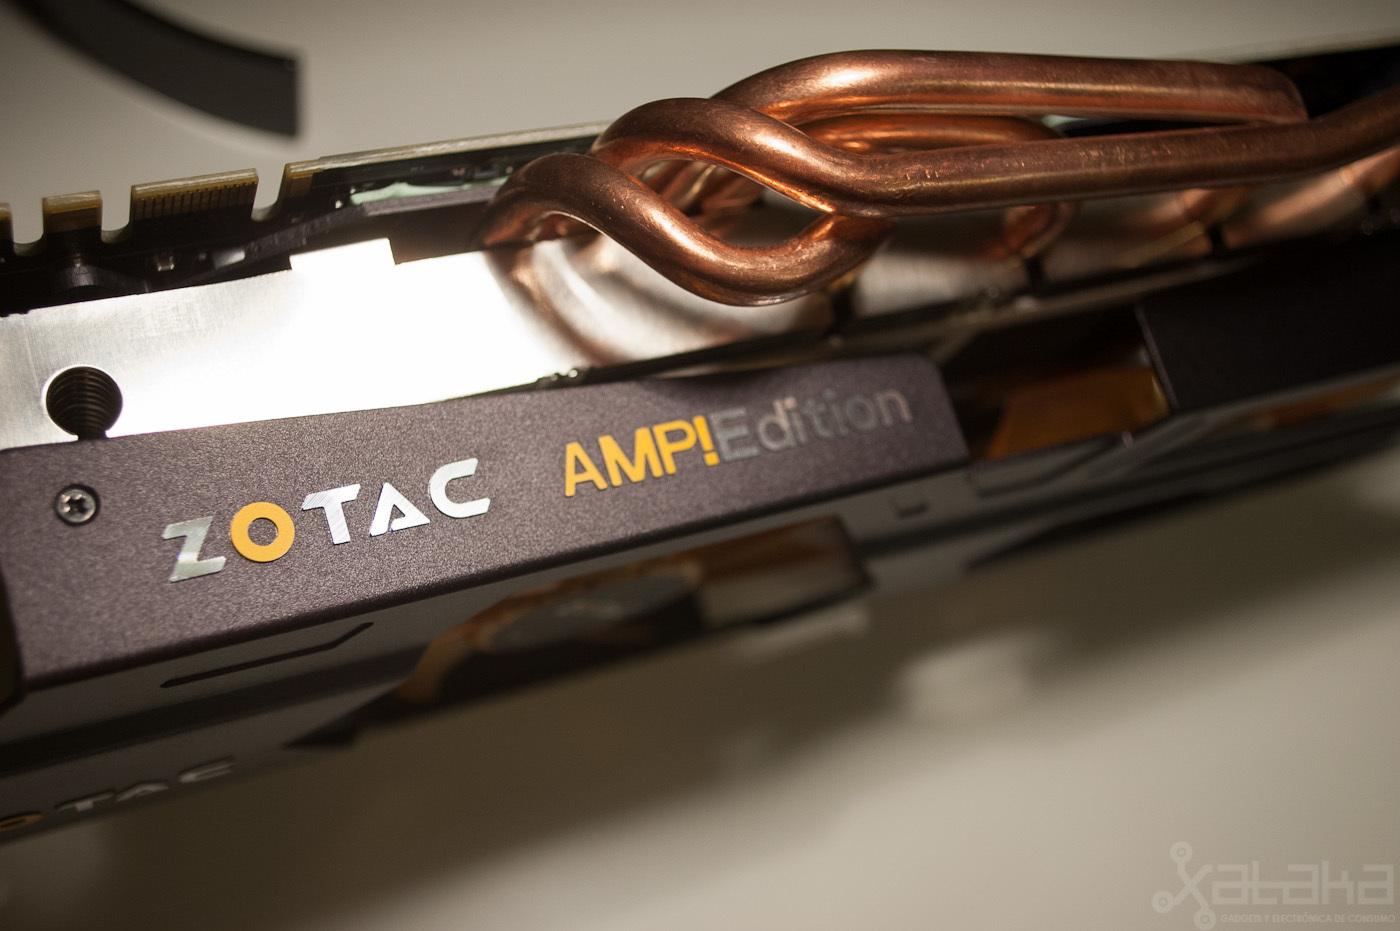 Foto de Zotac NVidia GTX 670, análisis (8/9)